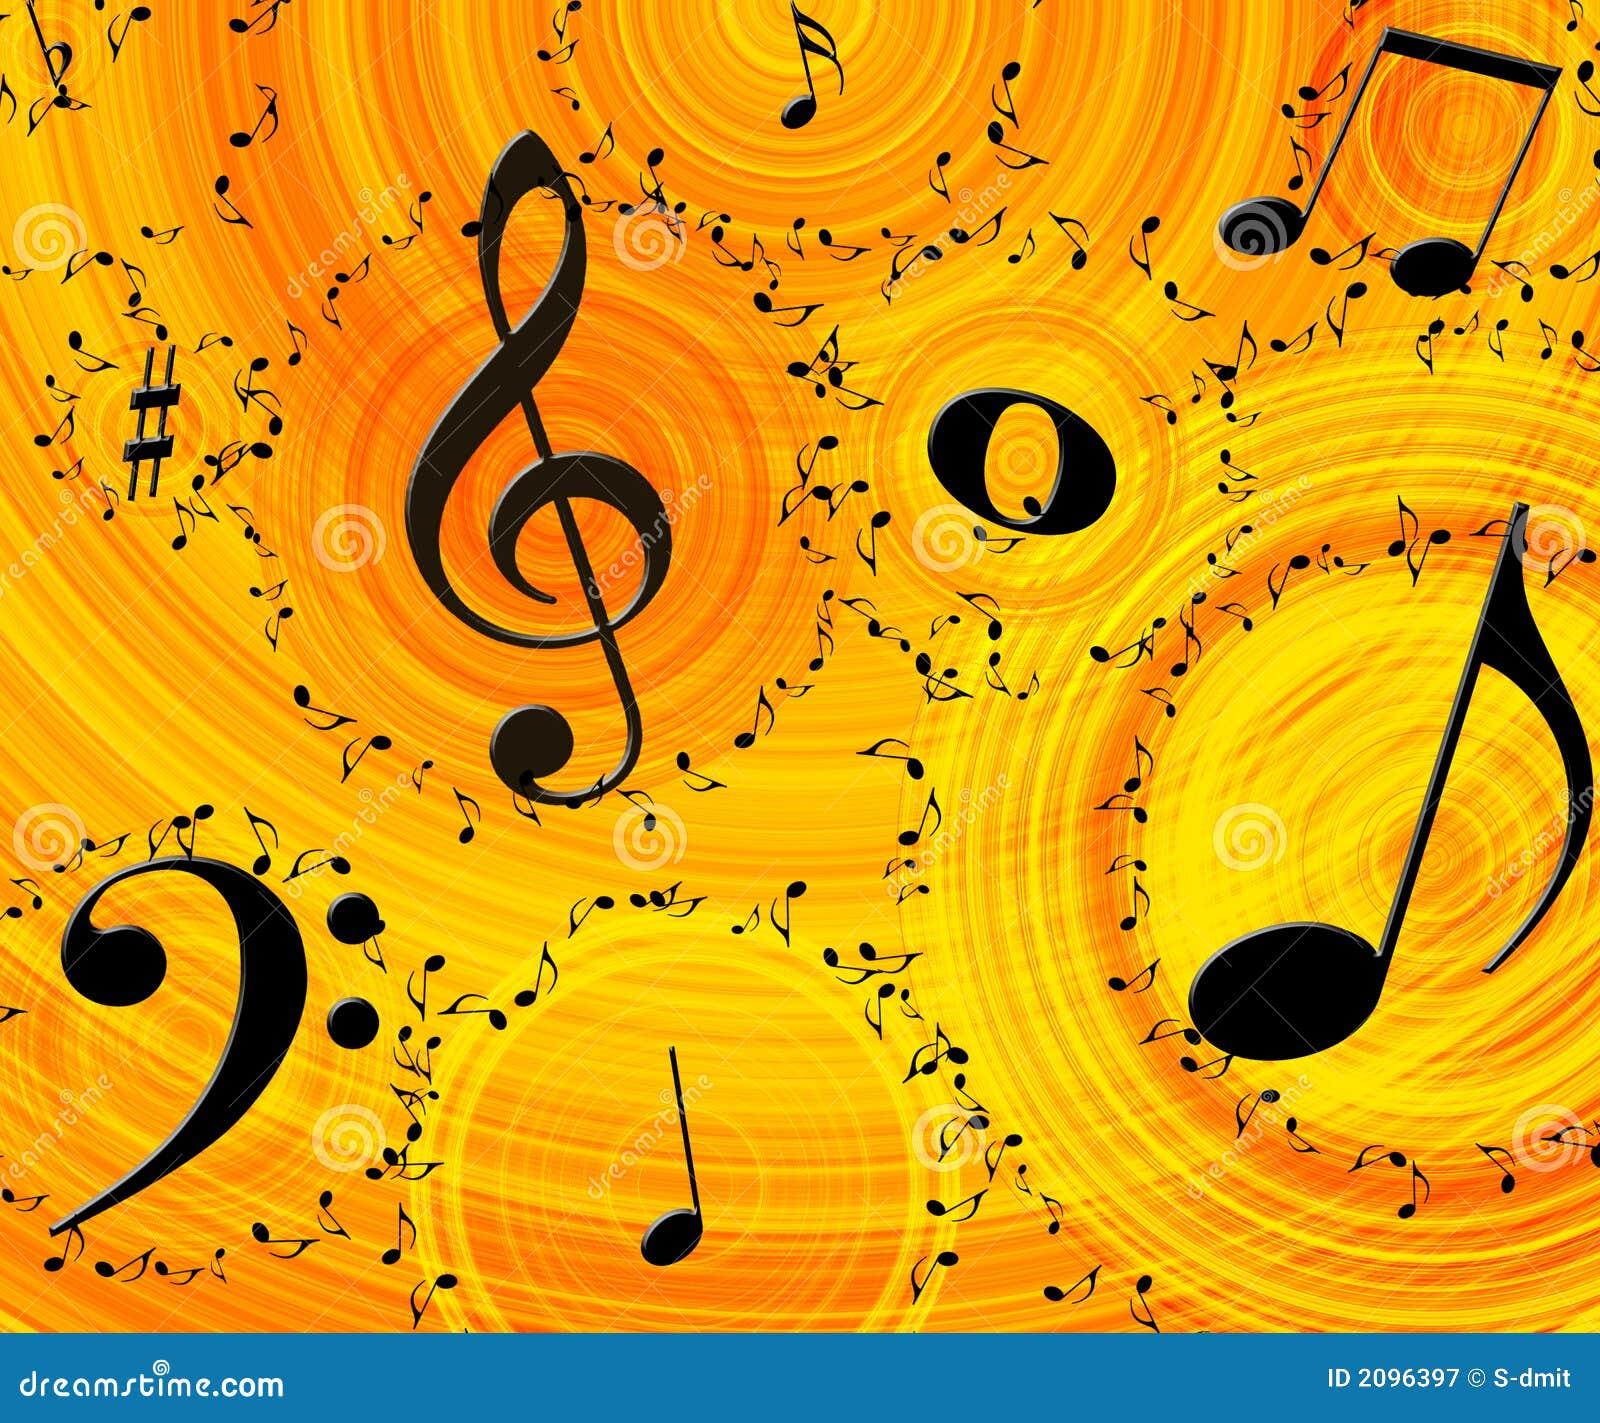 Music Background Royalty Free Stock Photography - Image: 2096397